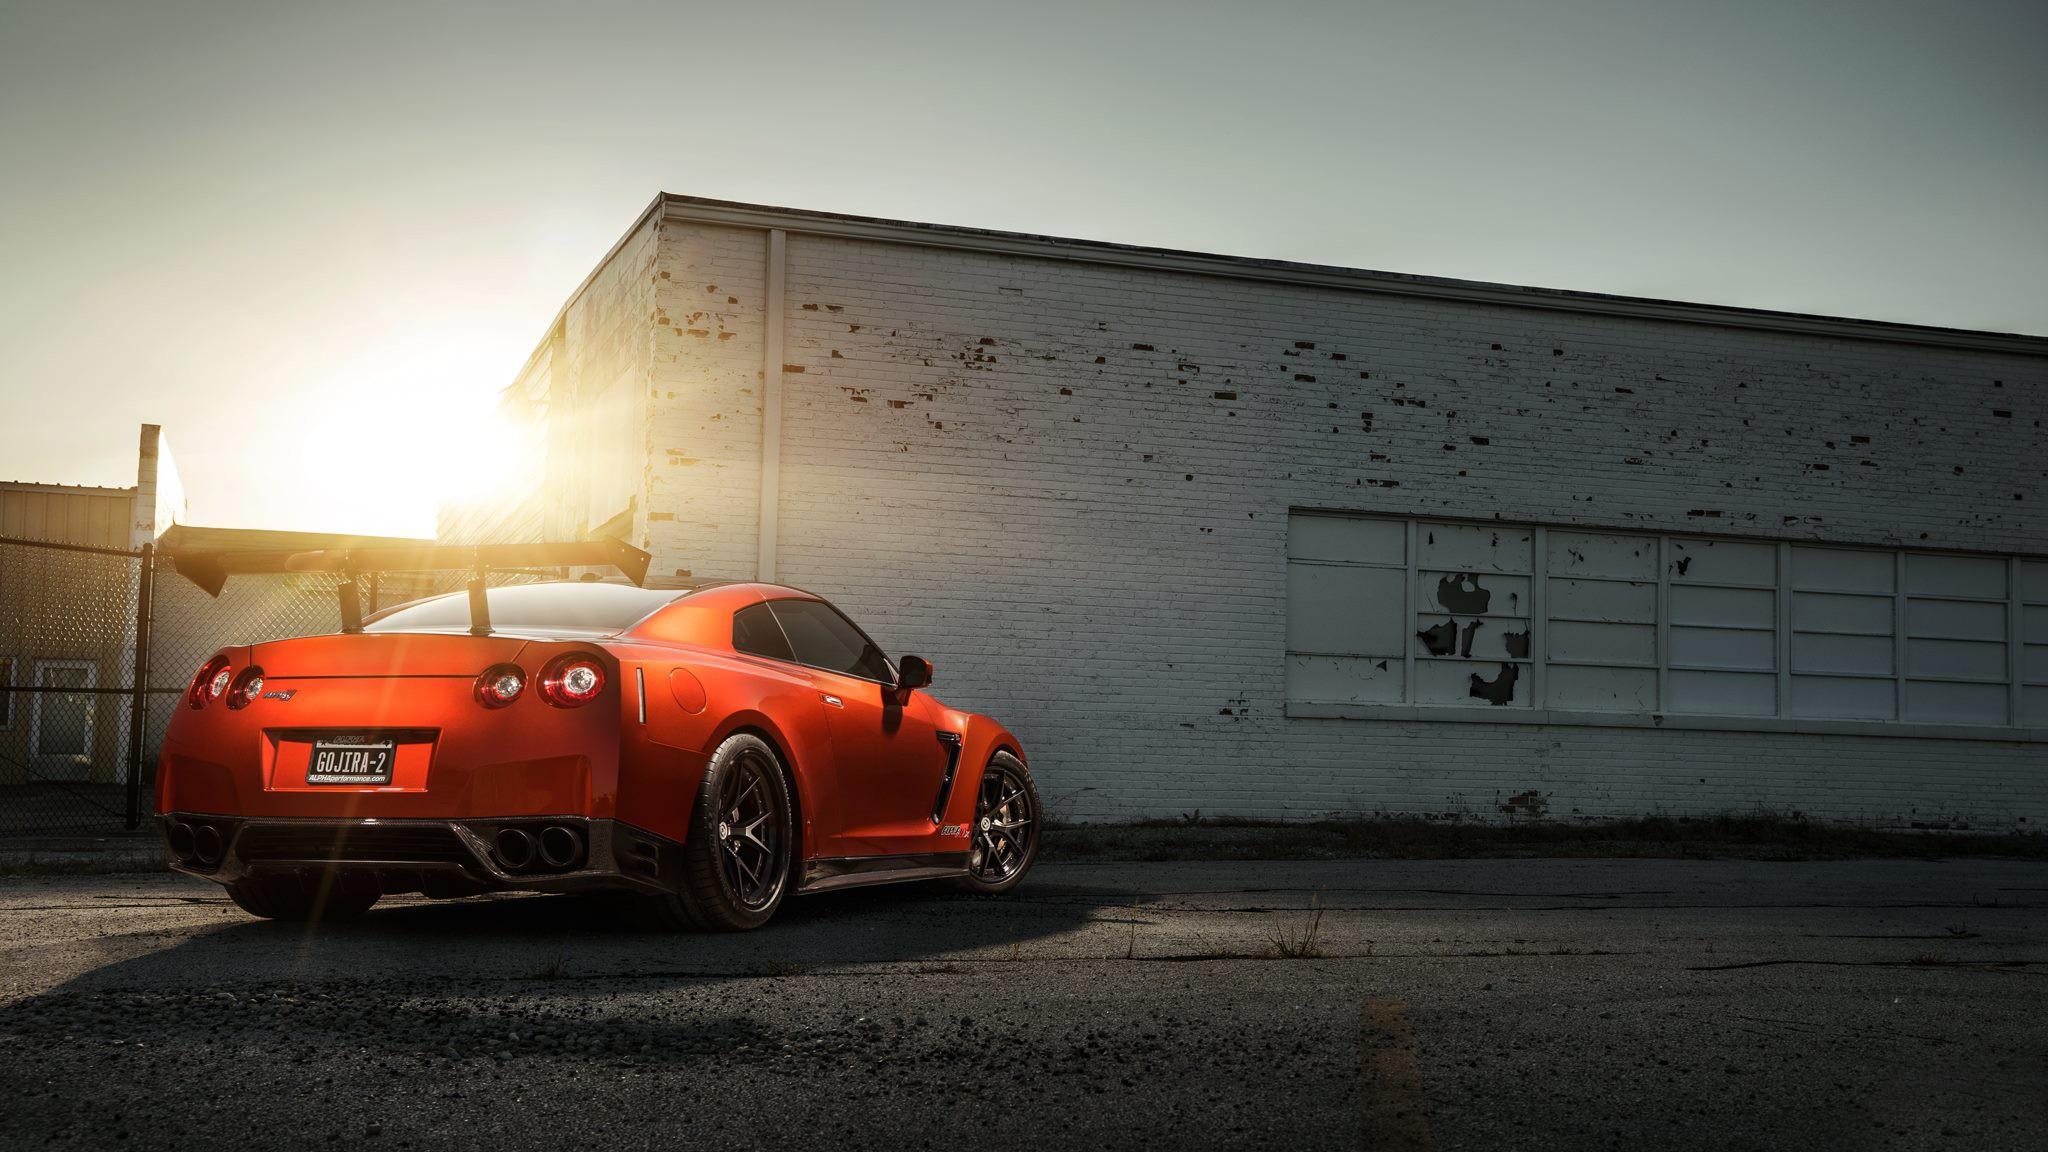 Nissan GTR HD